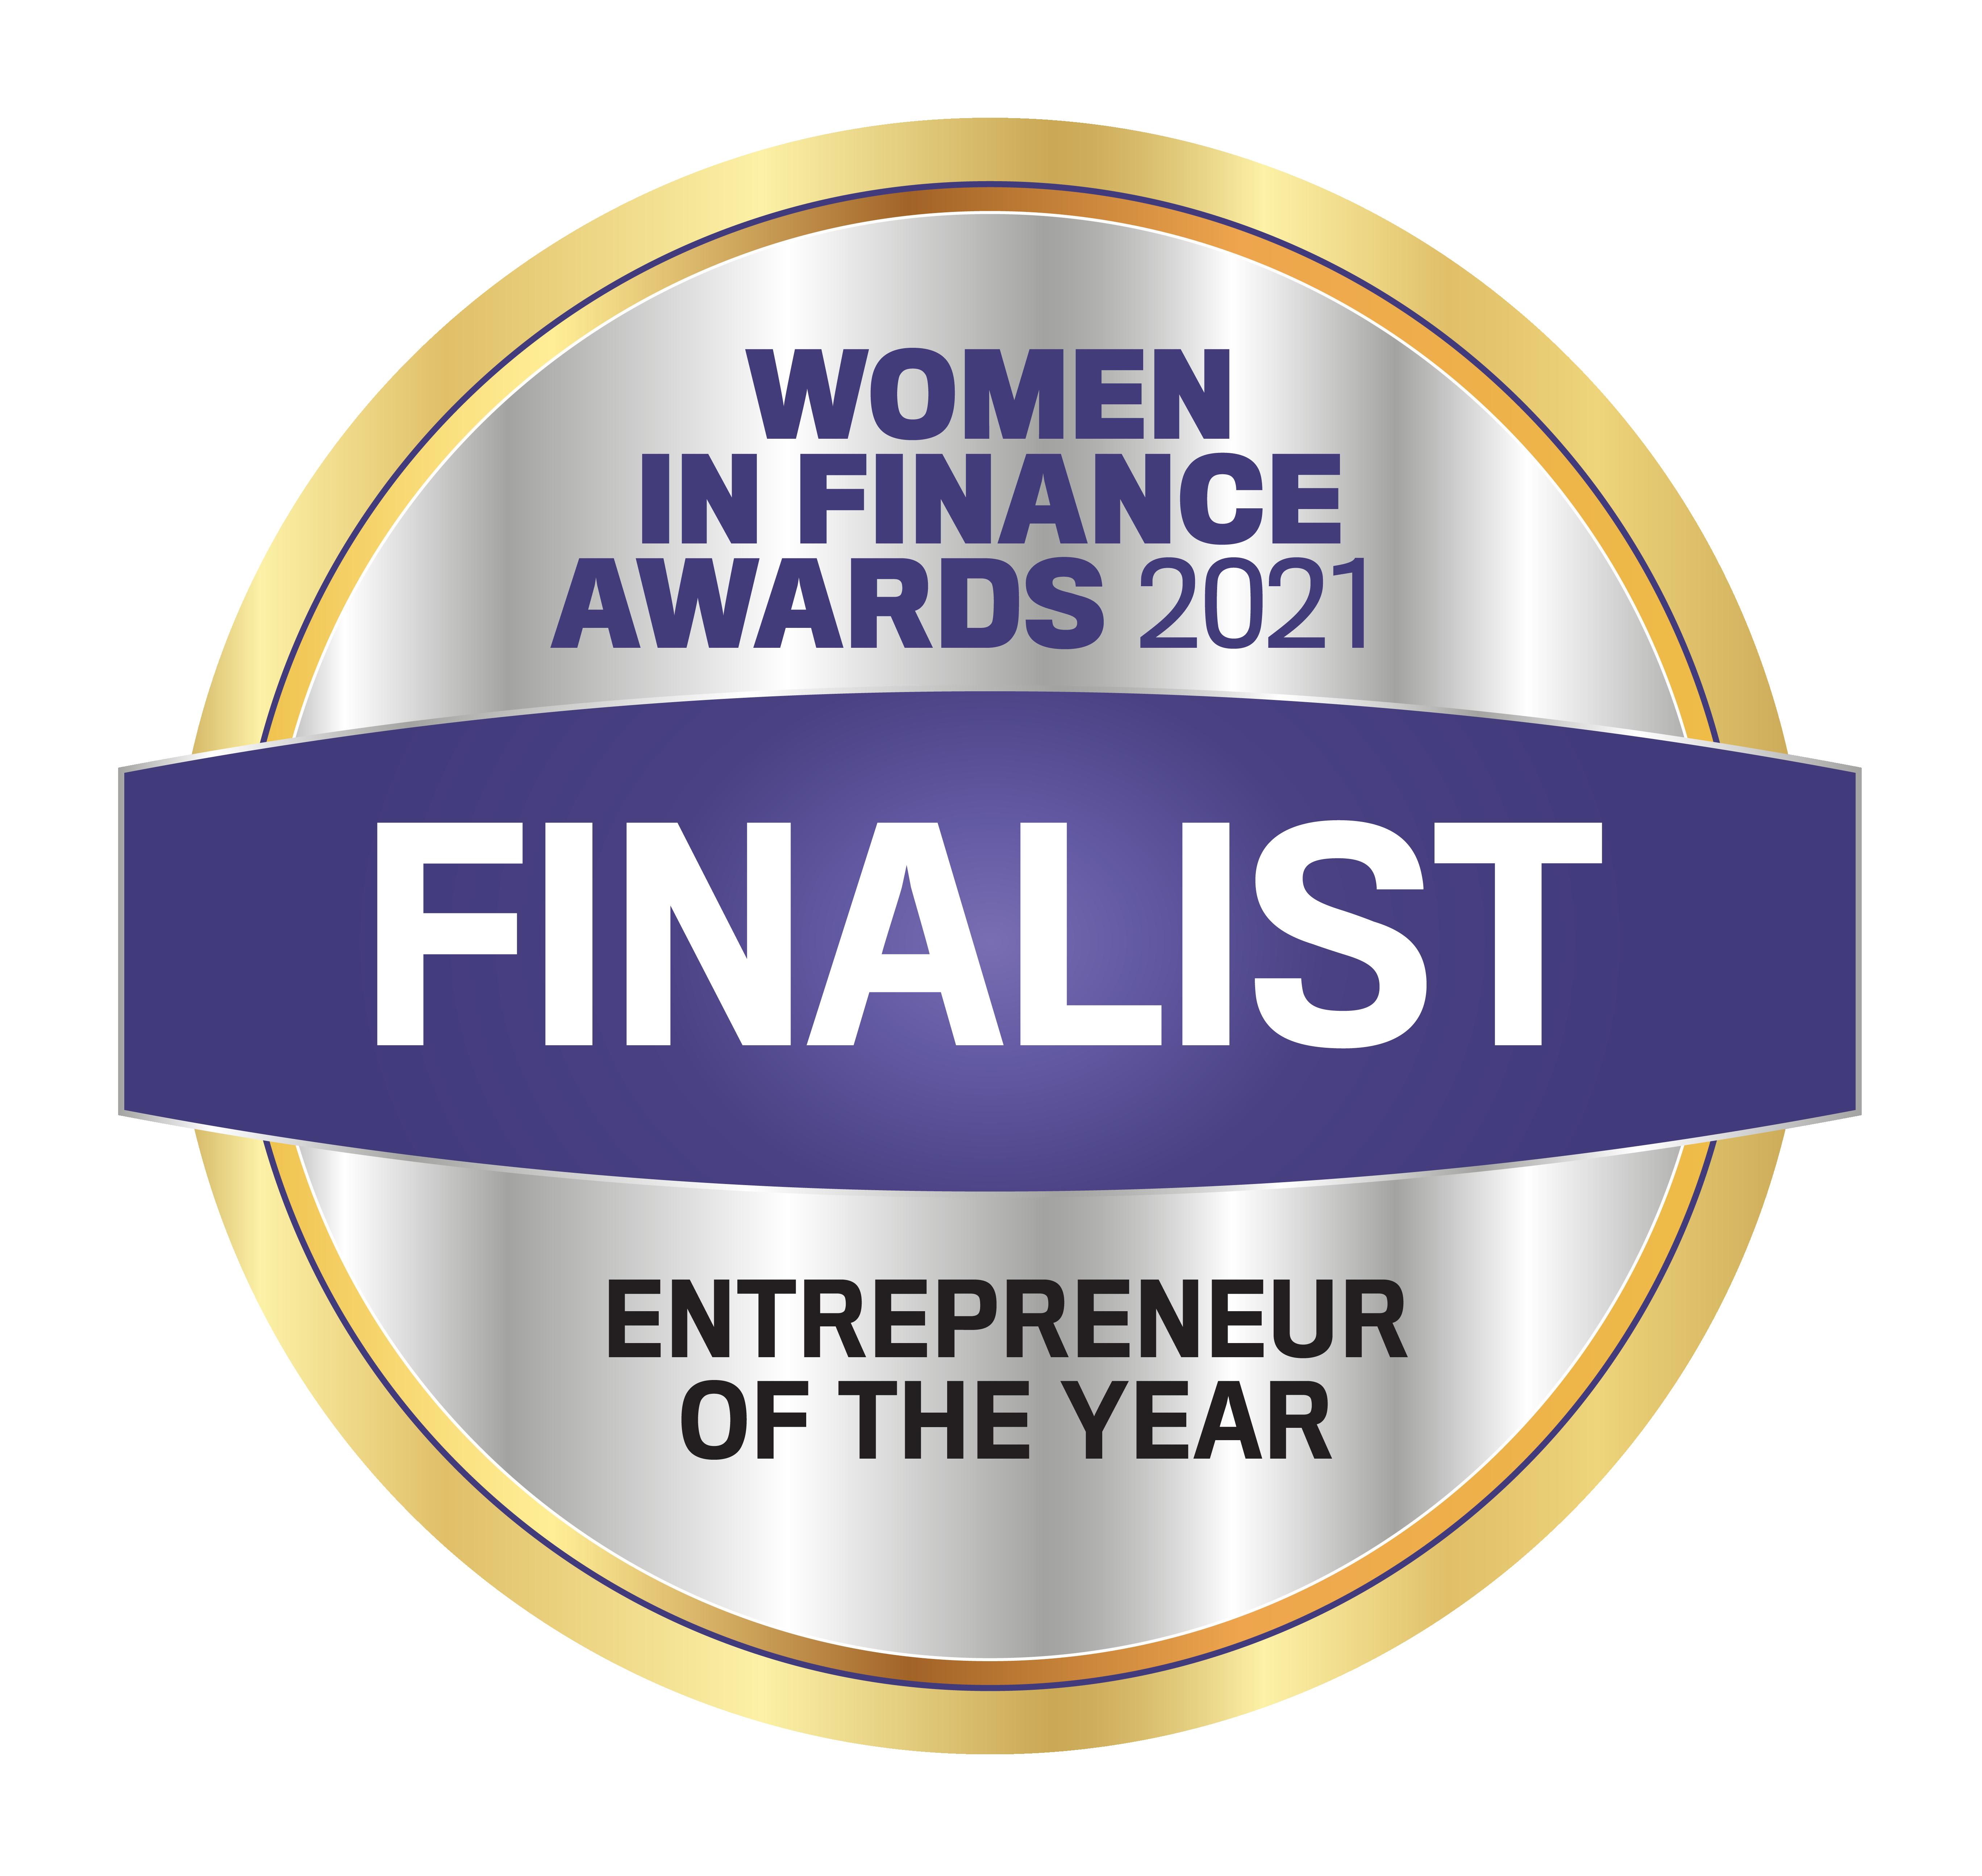 Women in Finance Award 2021 - entrepreneur of the Year WFS